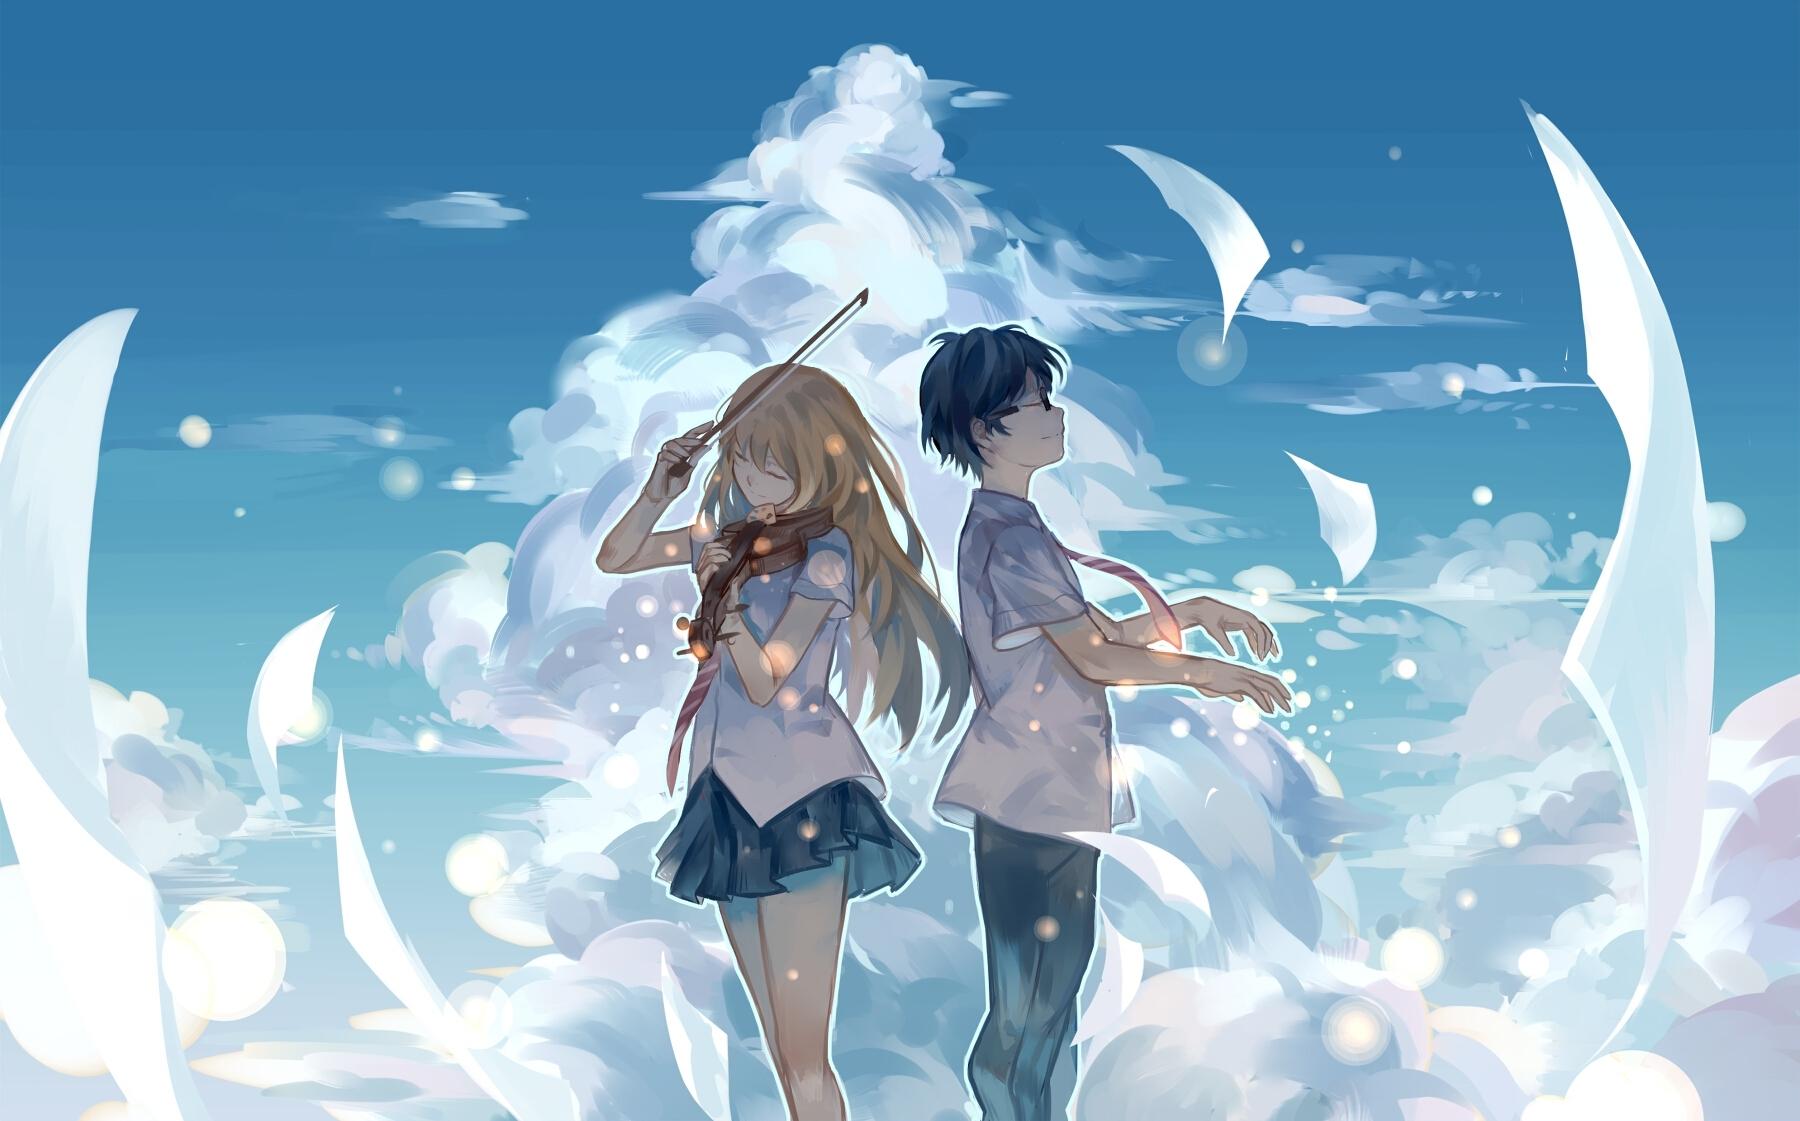 shigatsu wa kimi no uso (your lie in april) - zerochan anime image board